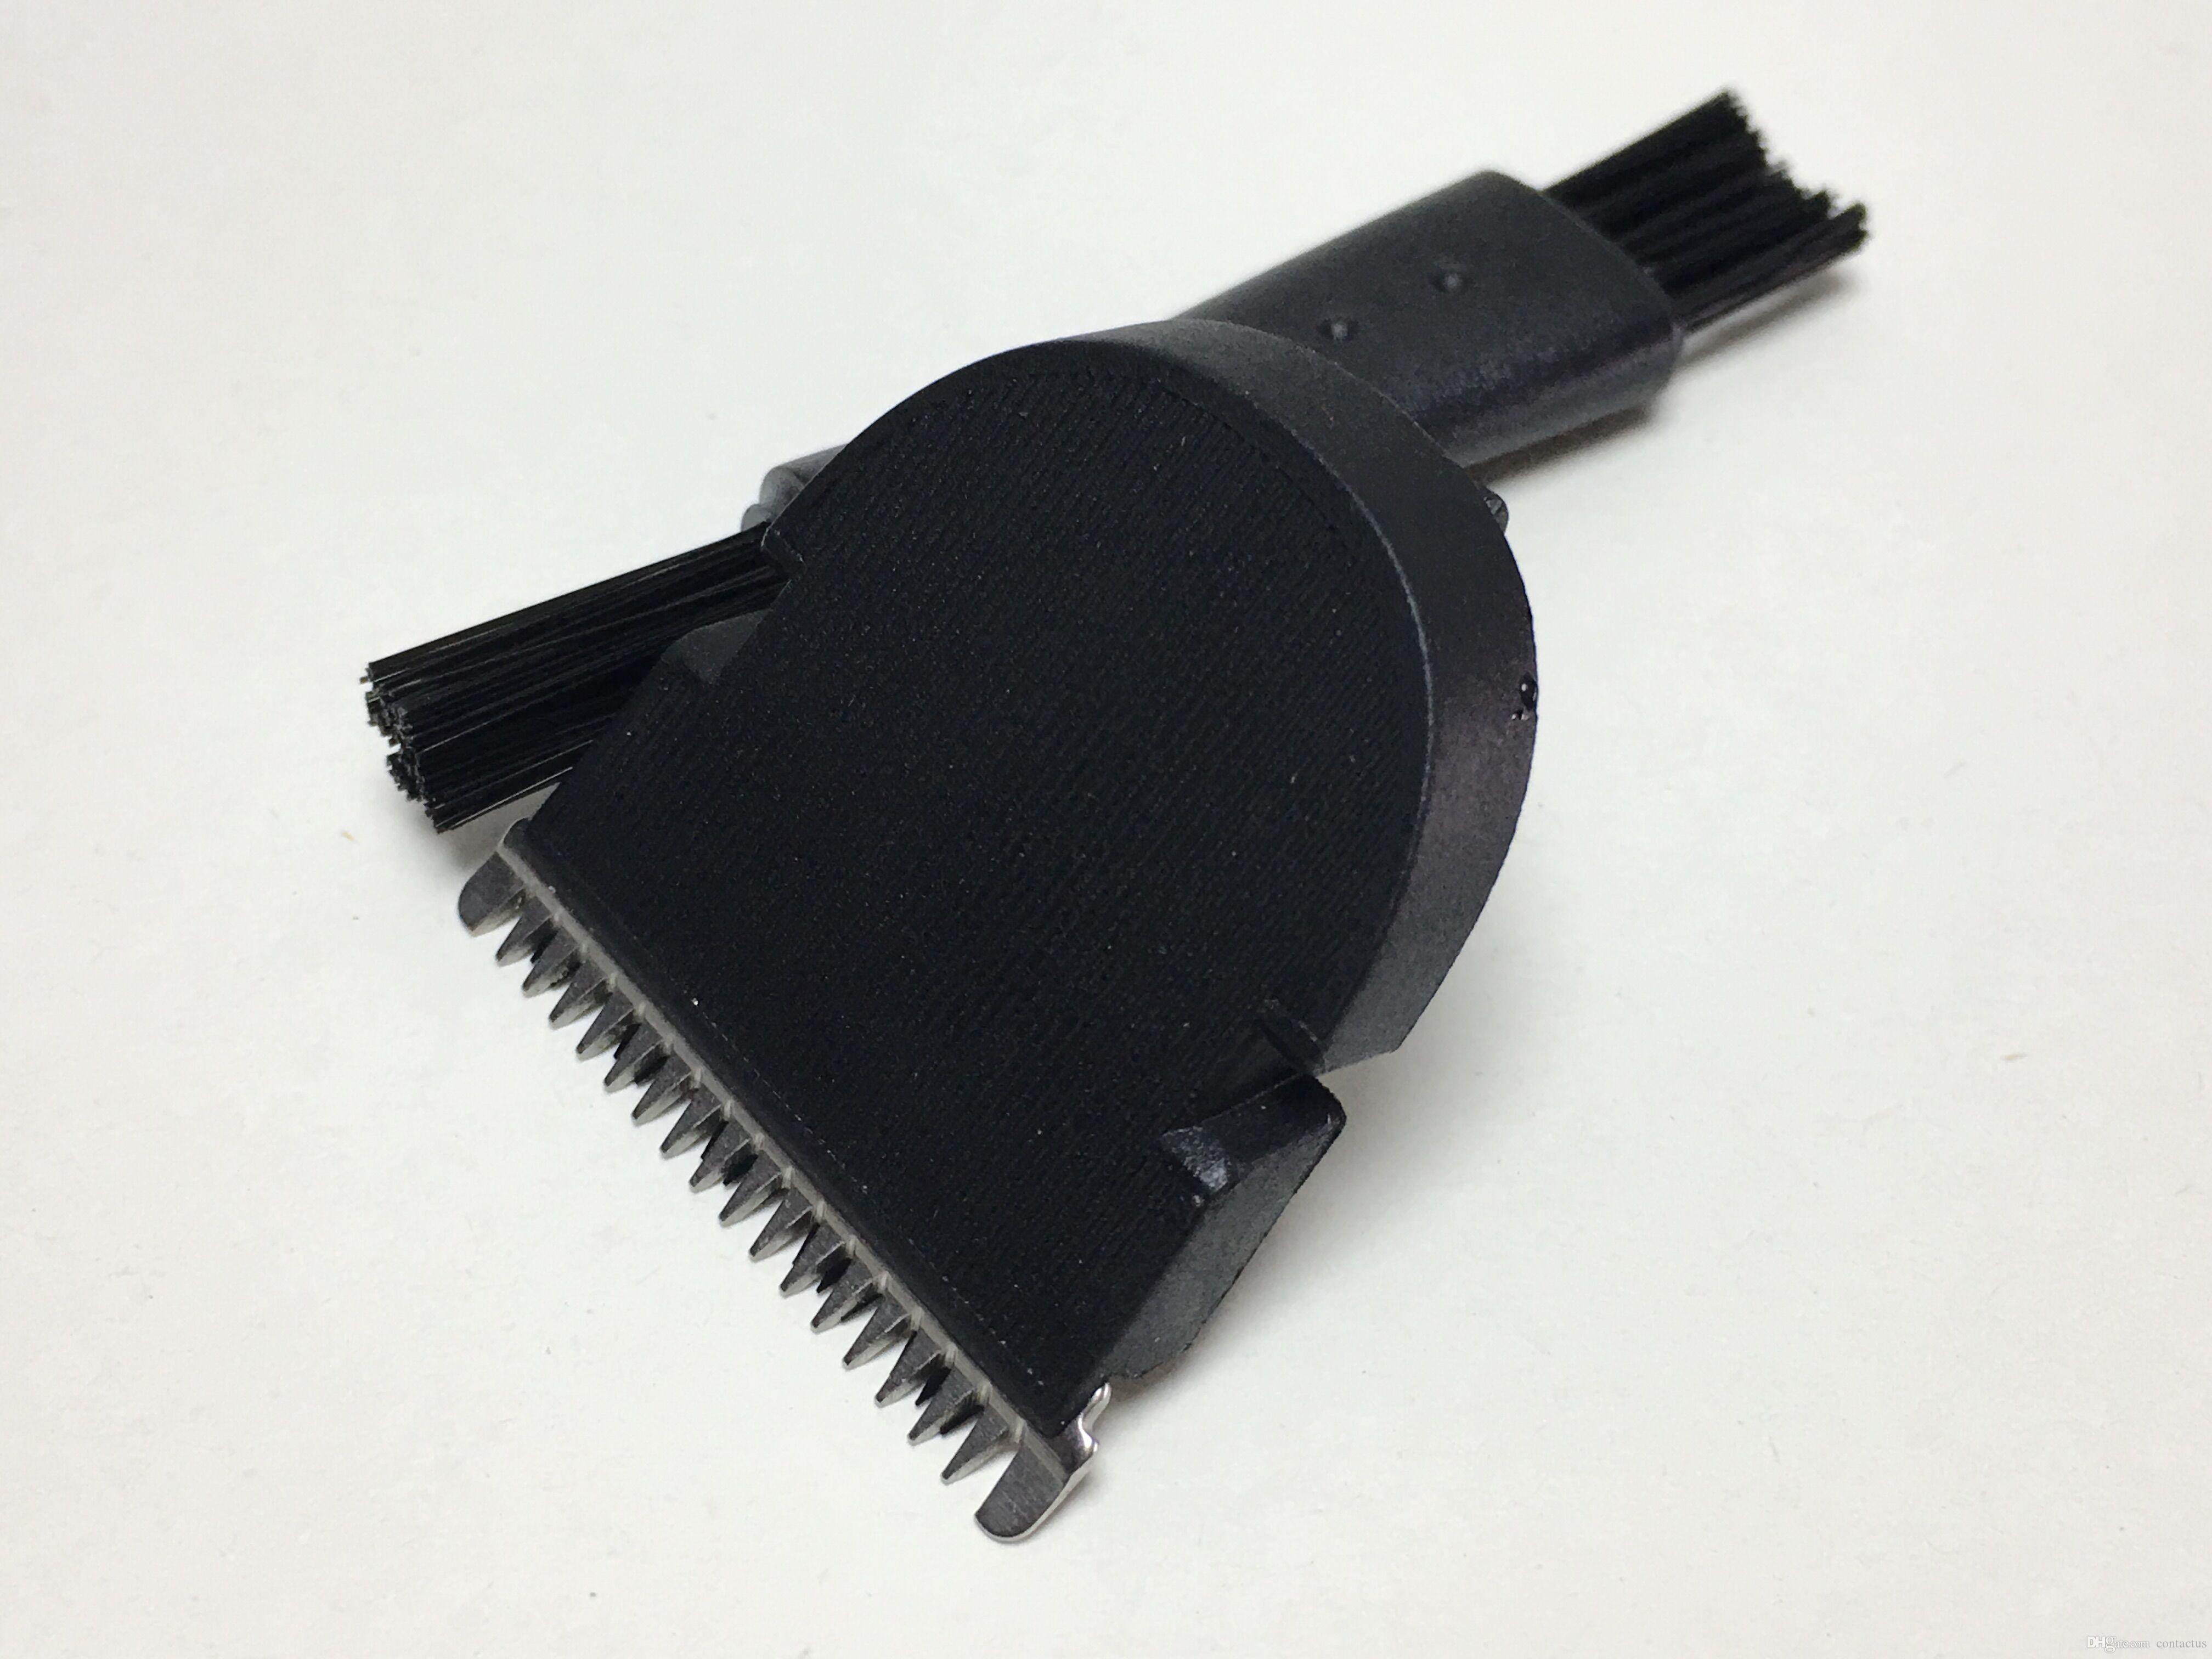 New Hair Clipper Beard Trimmer Blades For Philips QT4023 QT4024 QT4022 QT4022N QT4022/41 Shaver Razor Head Cutter Parts